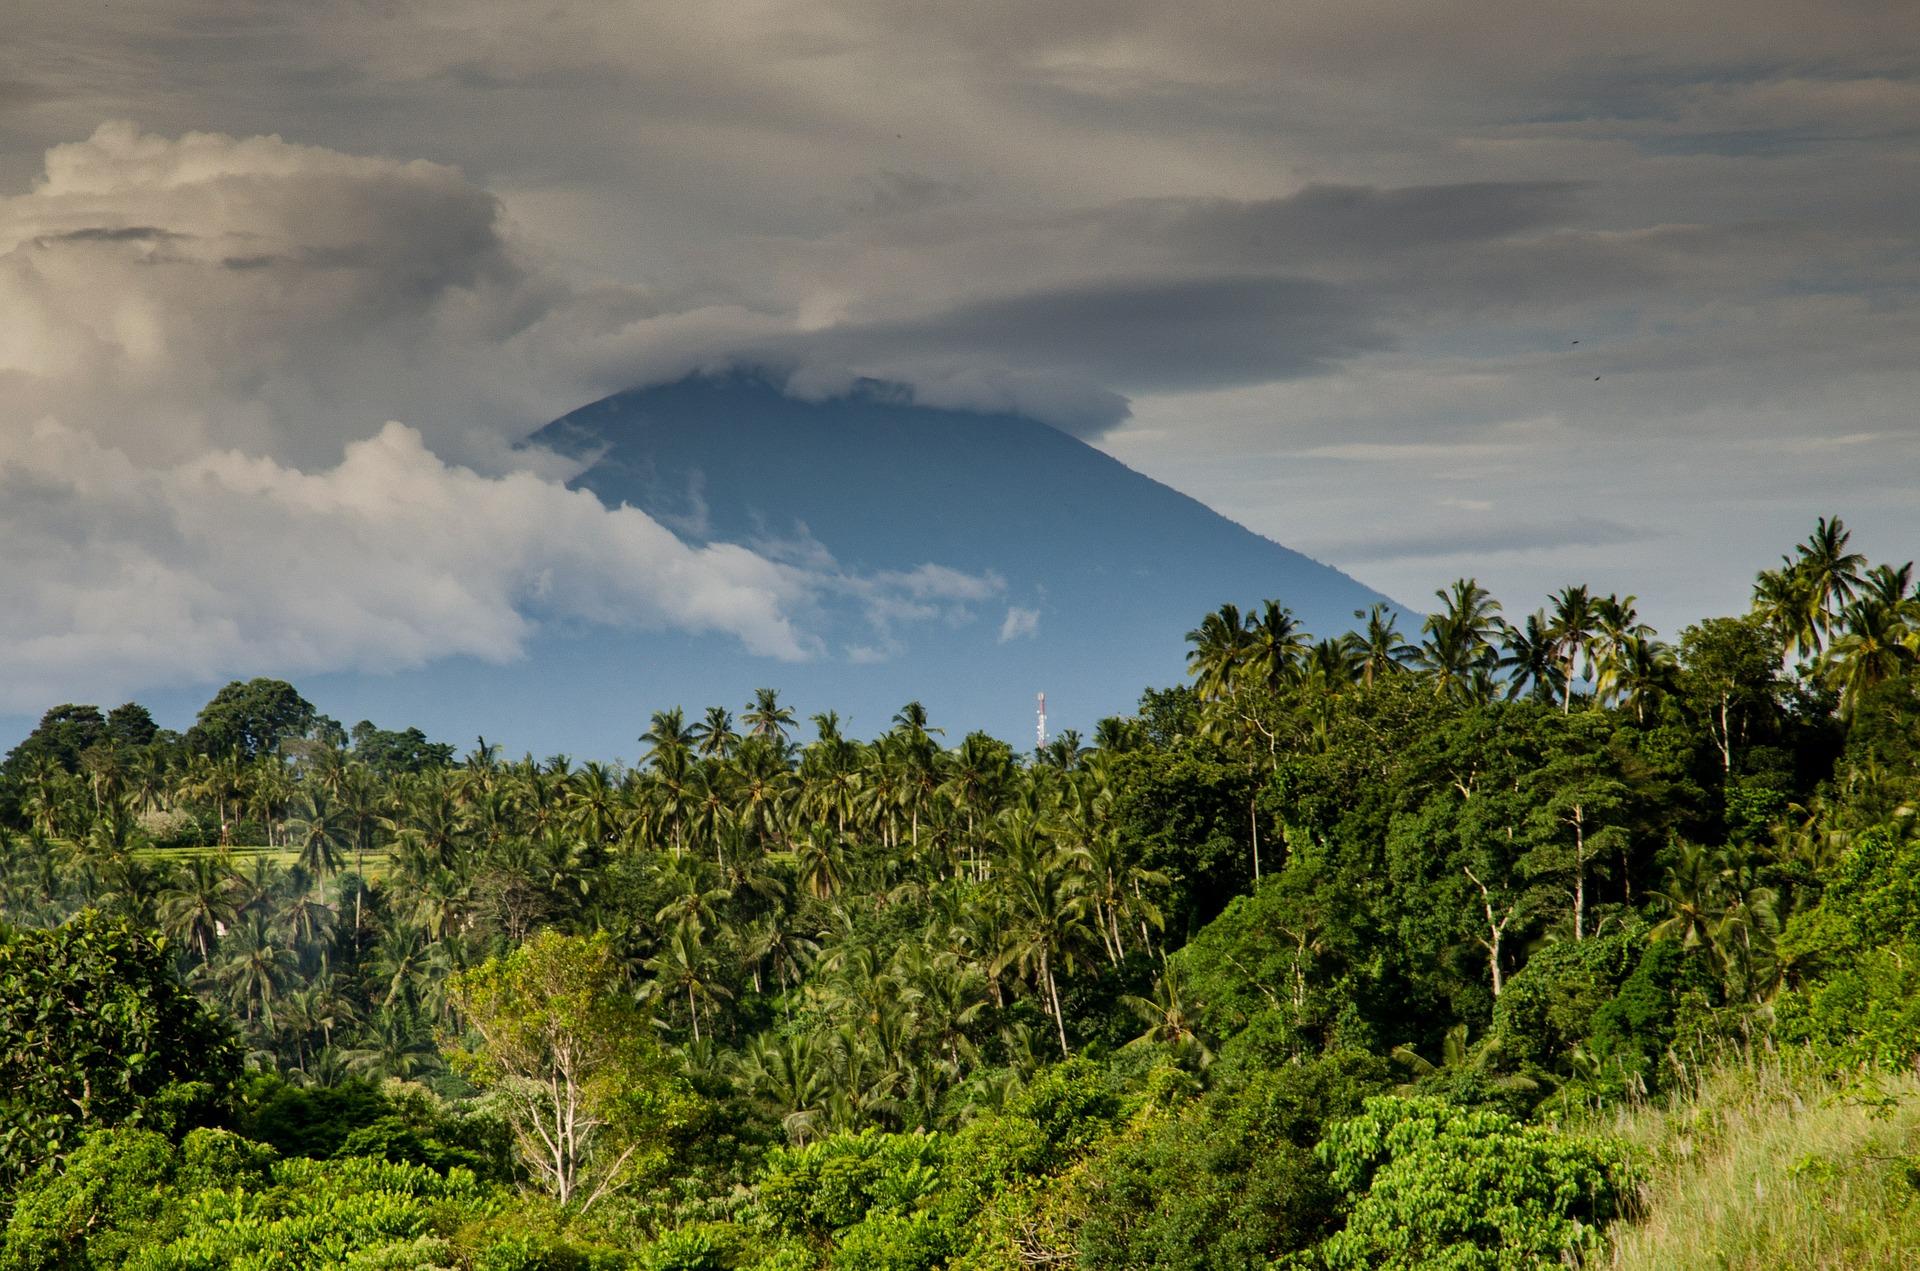 Costa Rica STM 2017 - Doris Yeung, CECSD